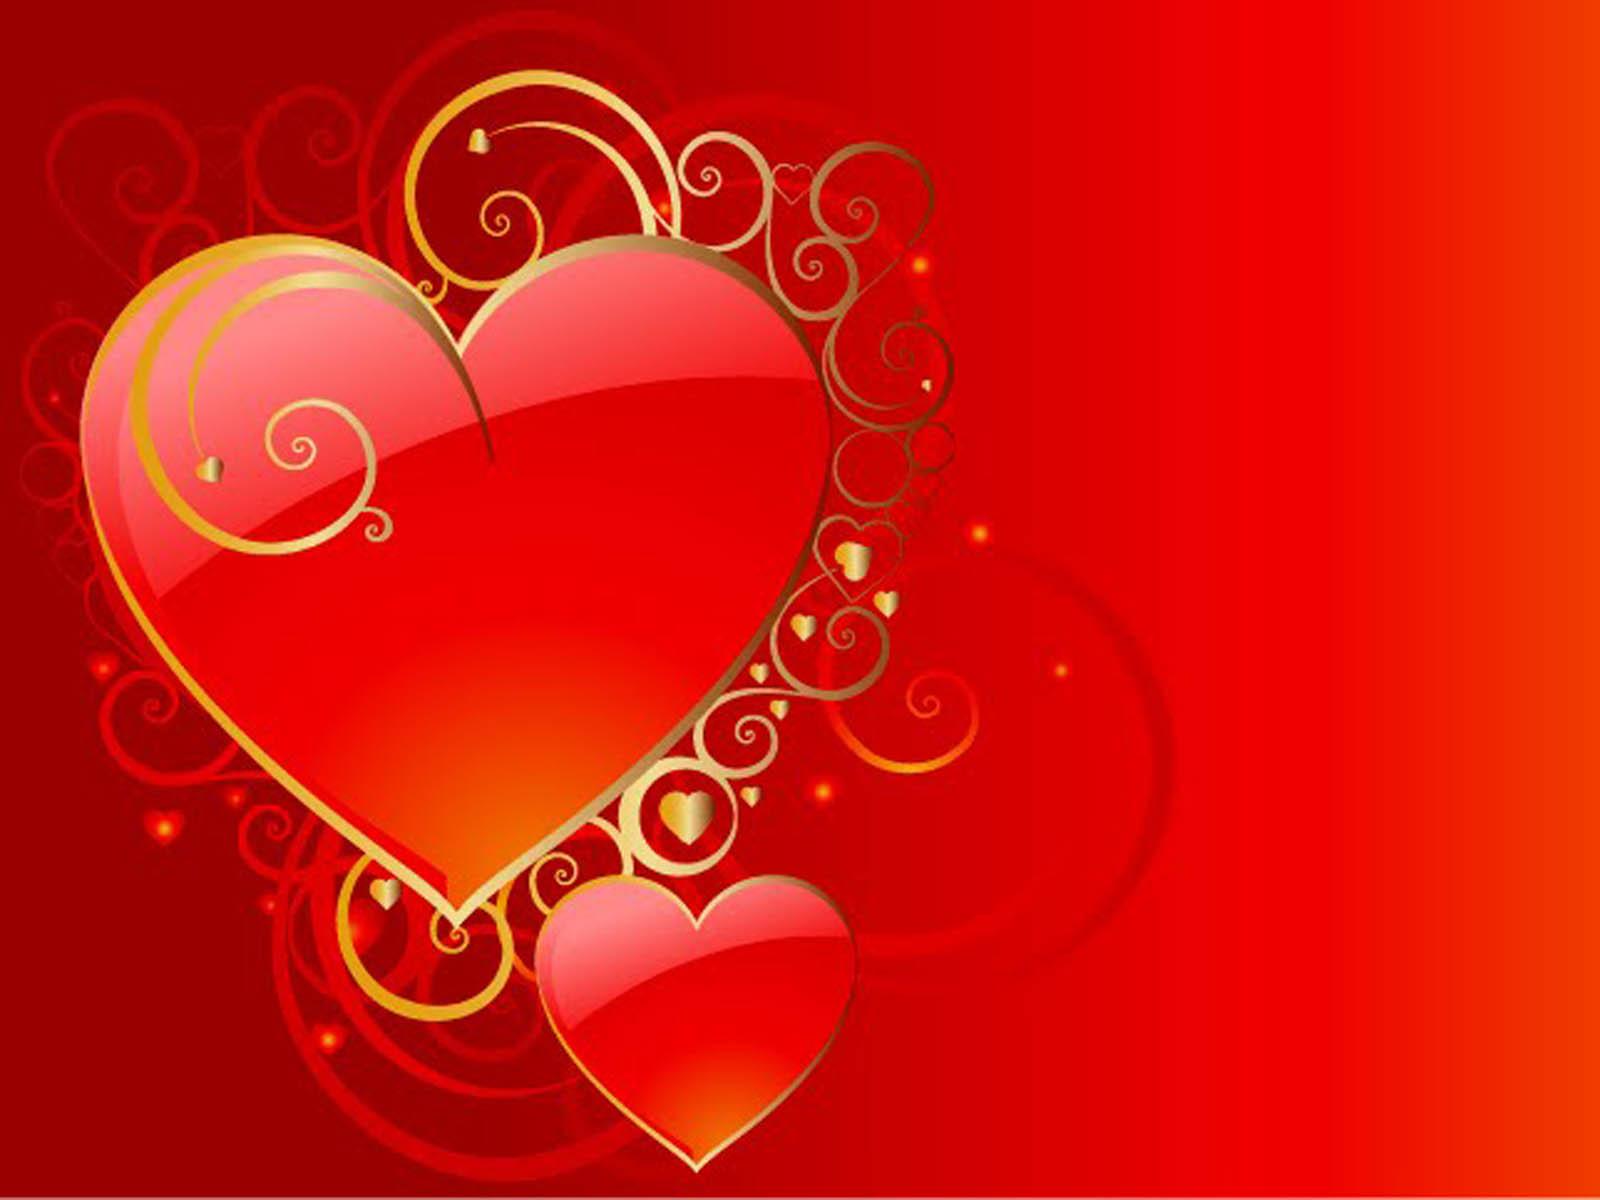 the Love Heart Wallpapers, Love Heart Desktop Wallpapers, Love Heart ...